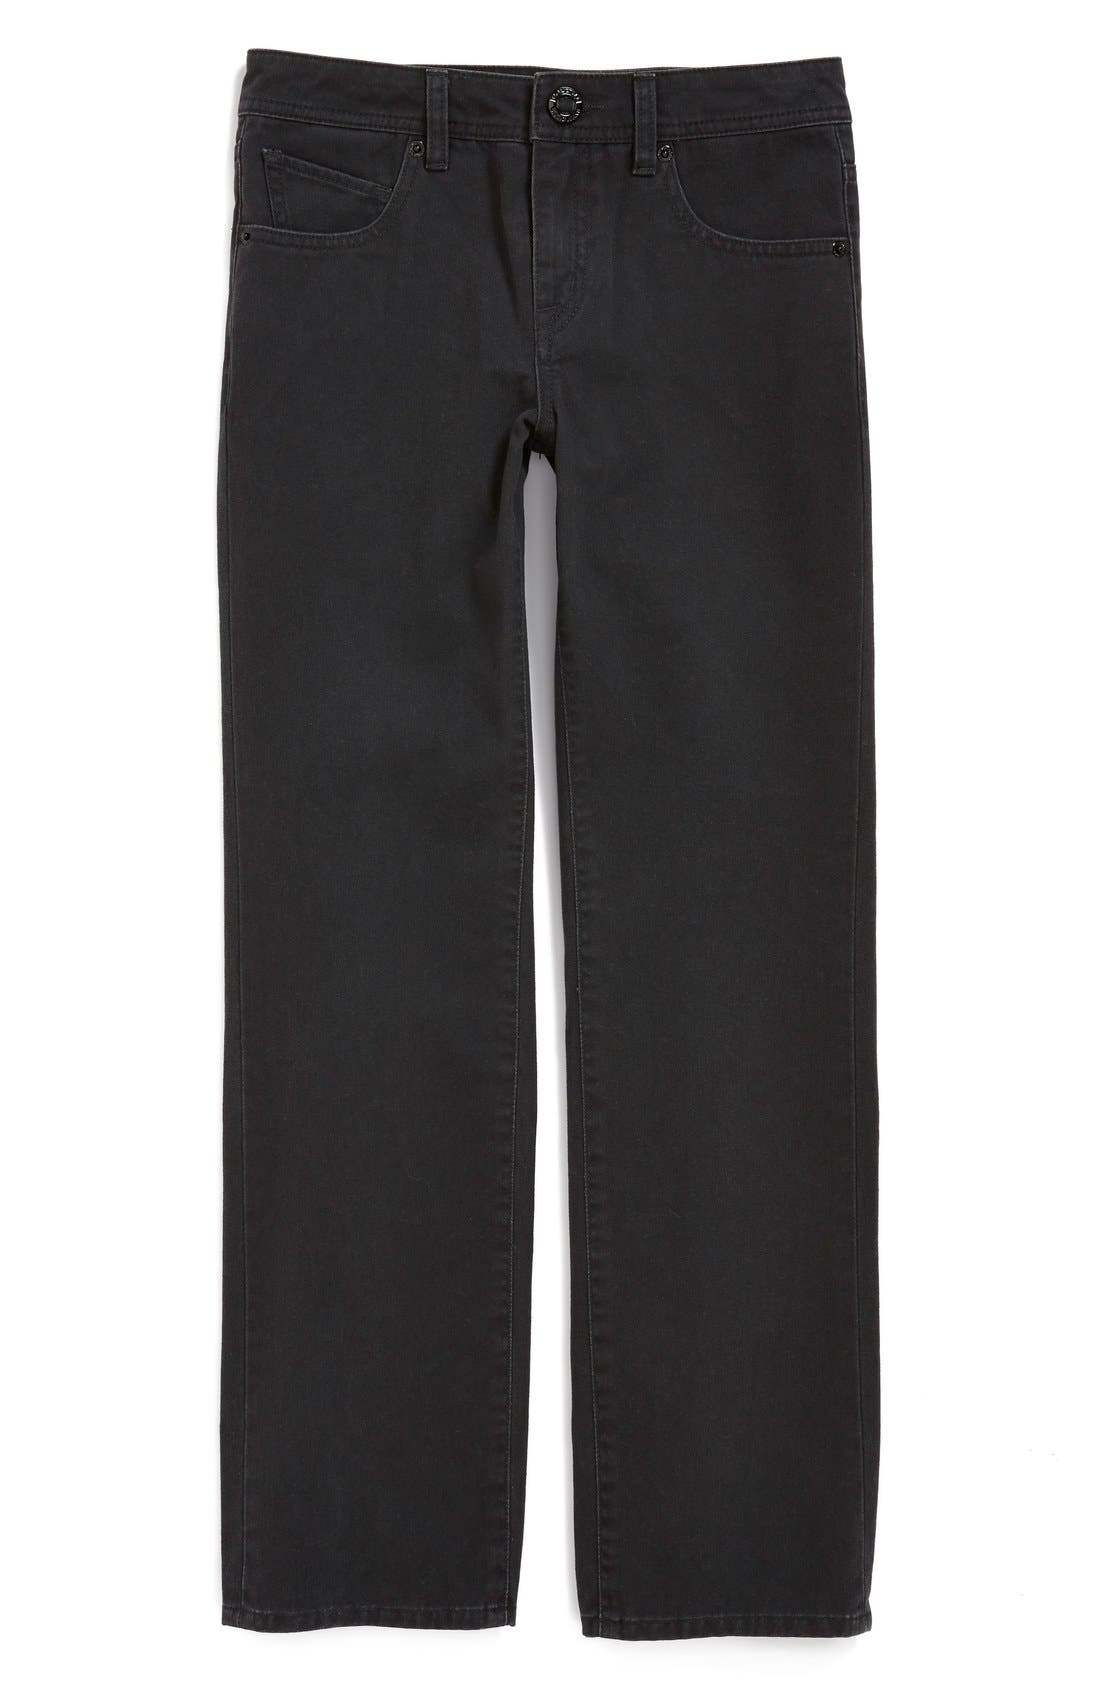 Alternate Image 1 Selected - Volcom 'Vorta' Slim Straight Leg Cotton Twill Pants (Toddler Boys & Little Boys) (Online Only)